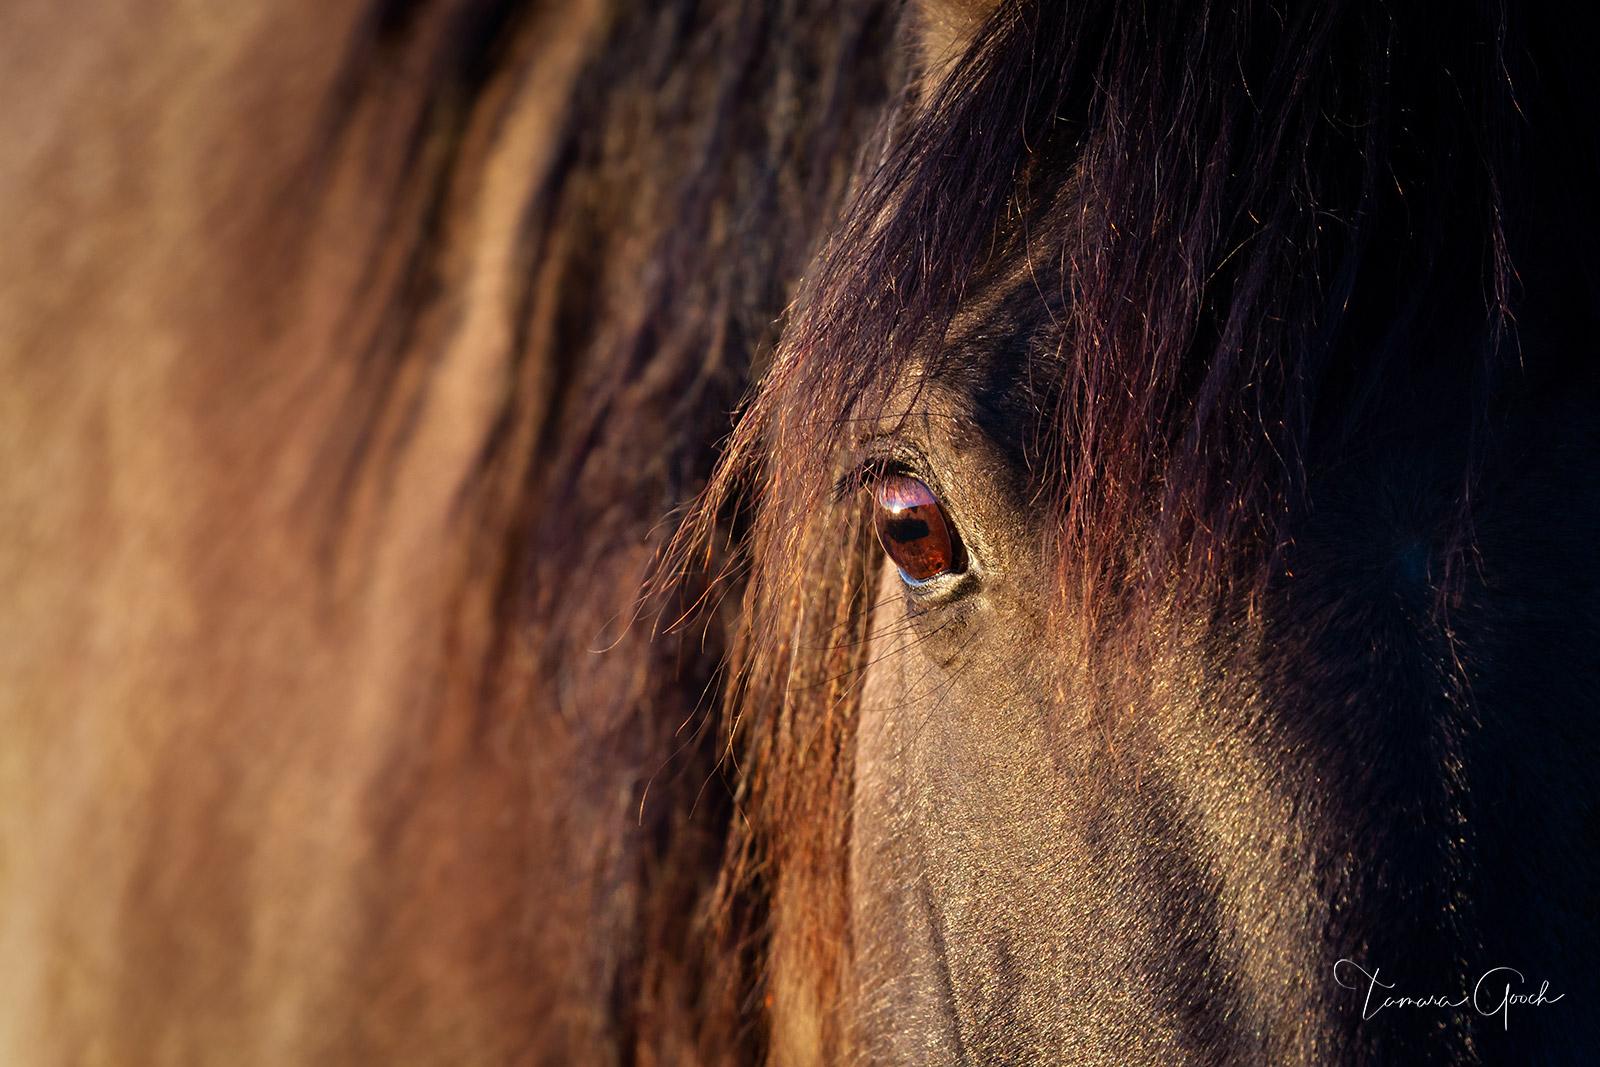 eye, horse eye, Sulphur Mustang, Mustang, horse, horses, photography, equine, equestrian, lifestyle, close up, cheval, caballos, wall art, art, interior, design, home, decor, rustic, farmhouse, modern, photo